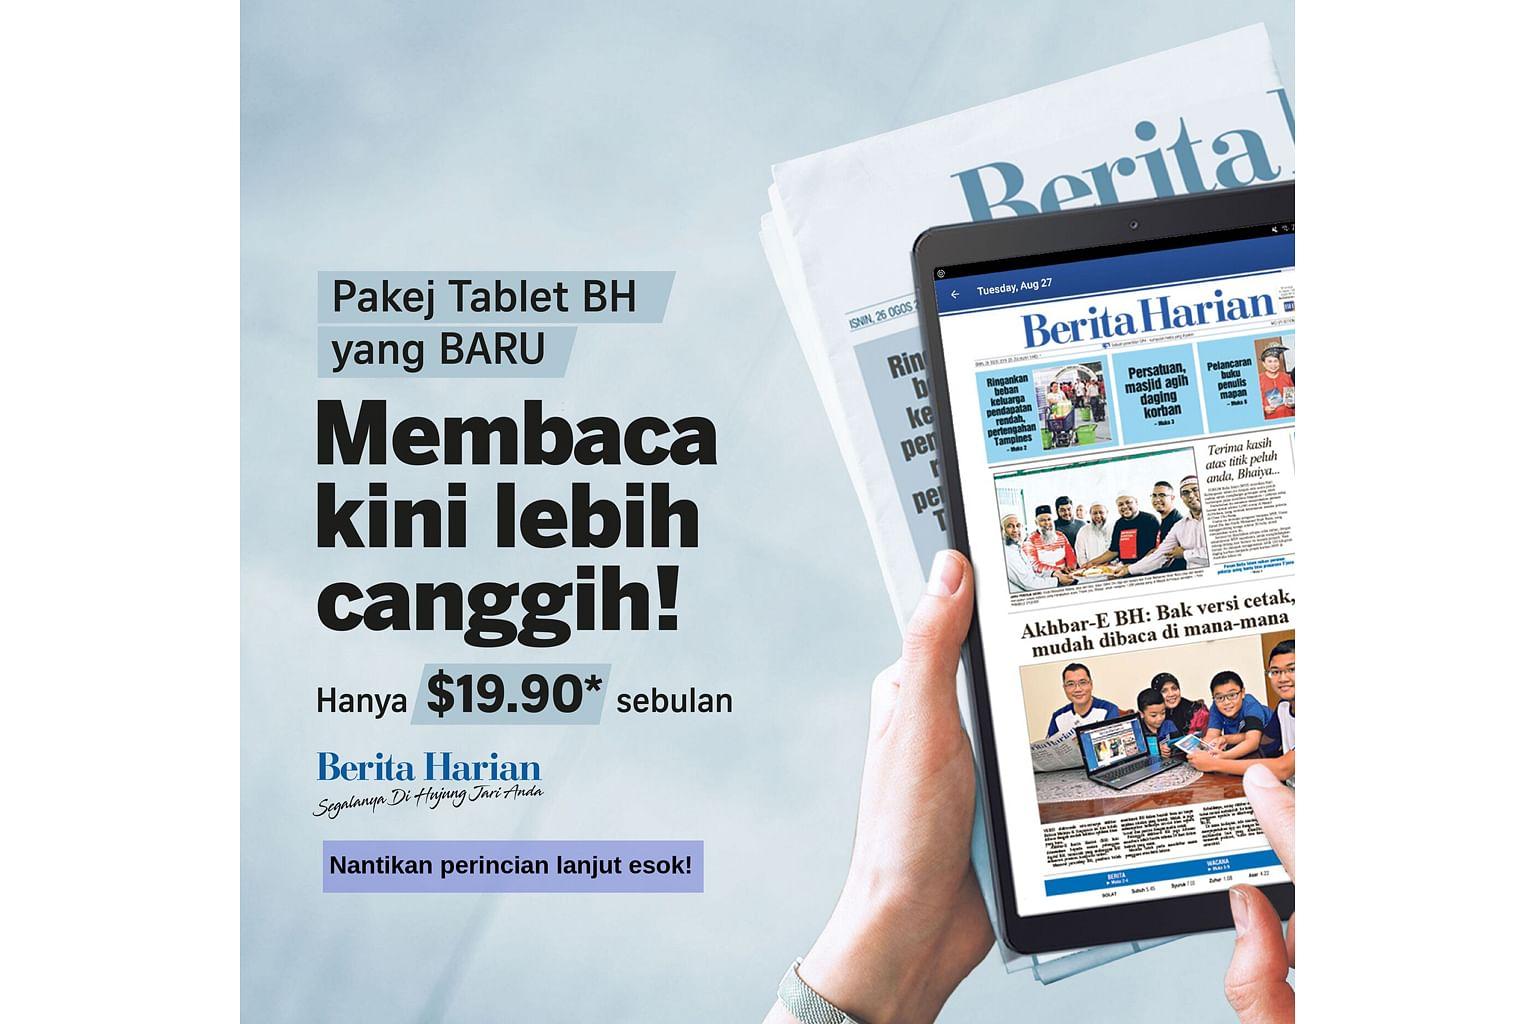 Pakej langganan istimewa Tablet BH dilancar 18 September